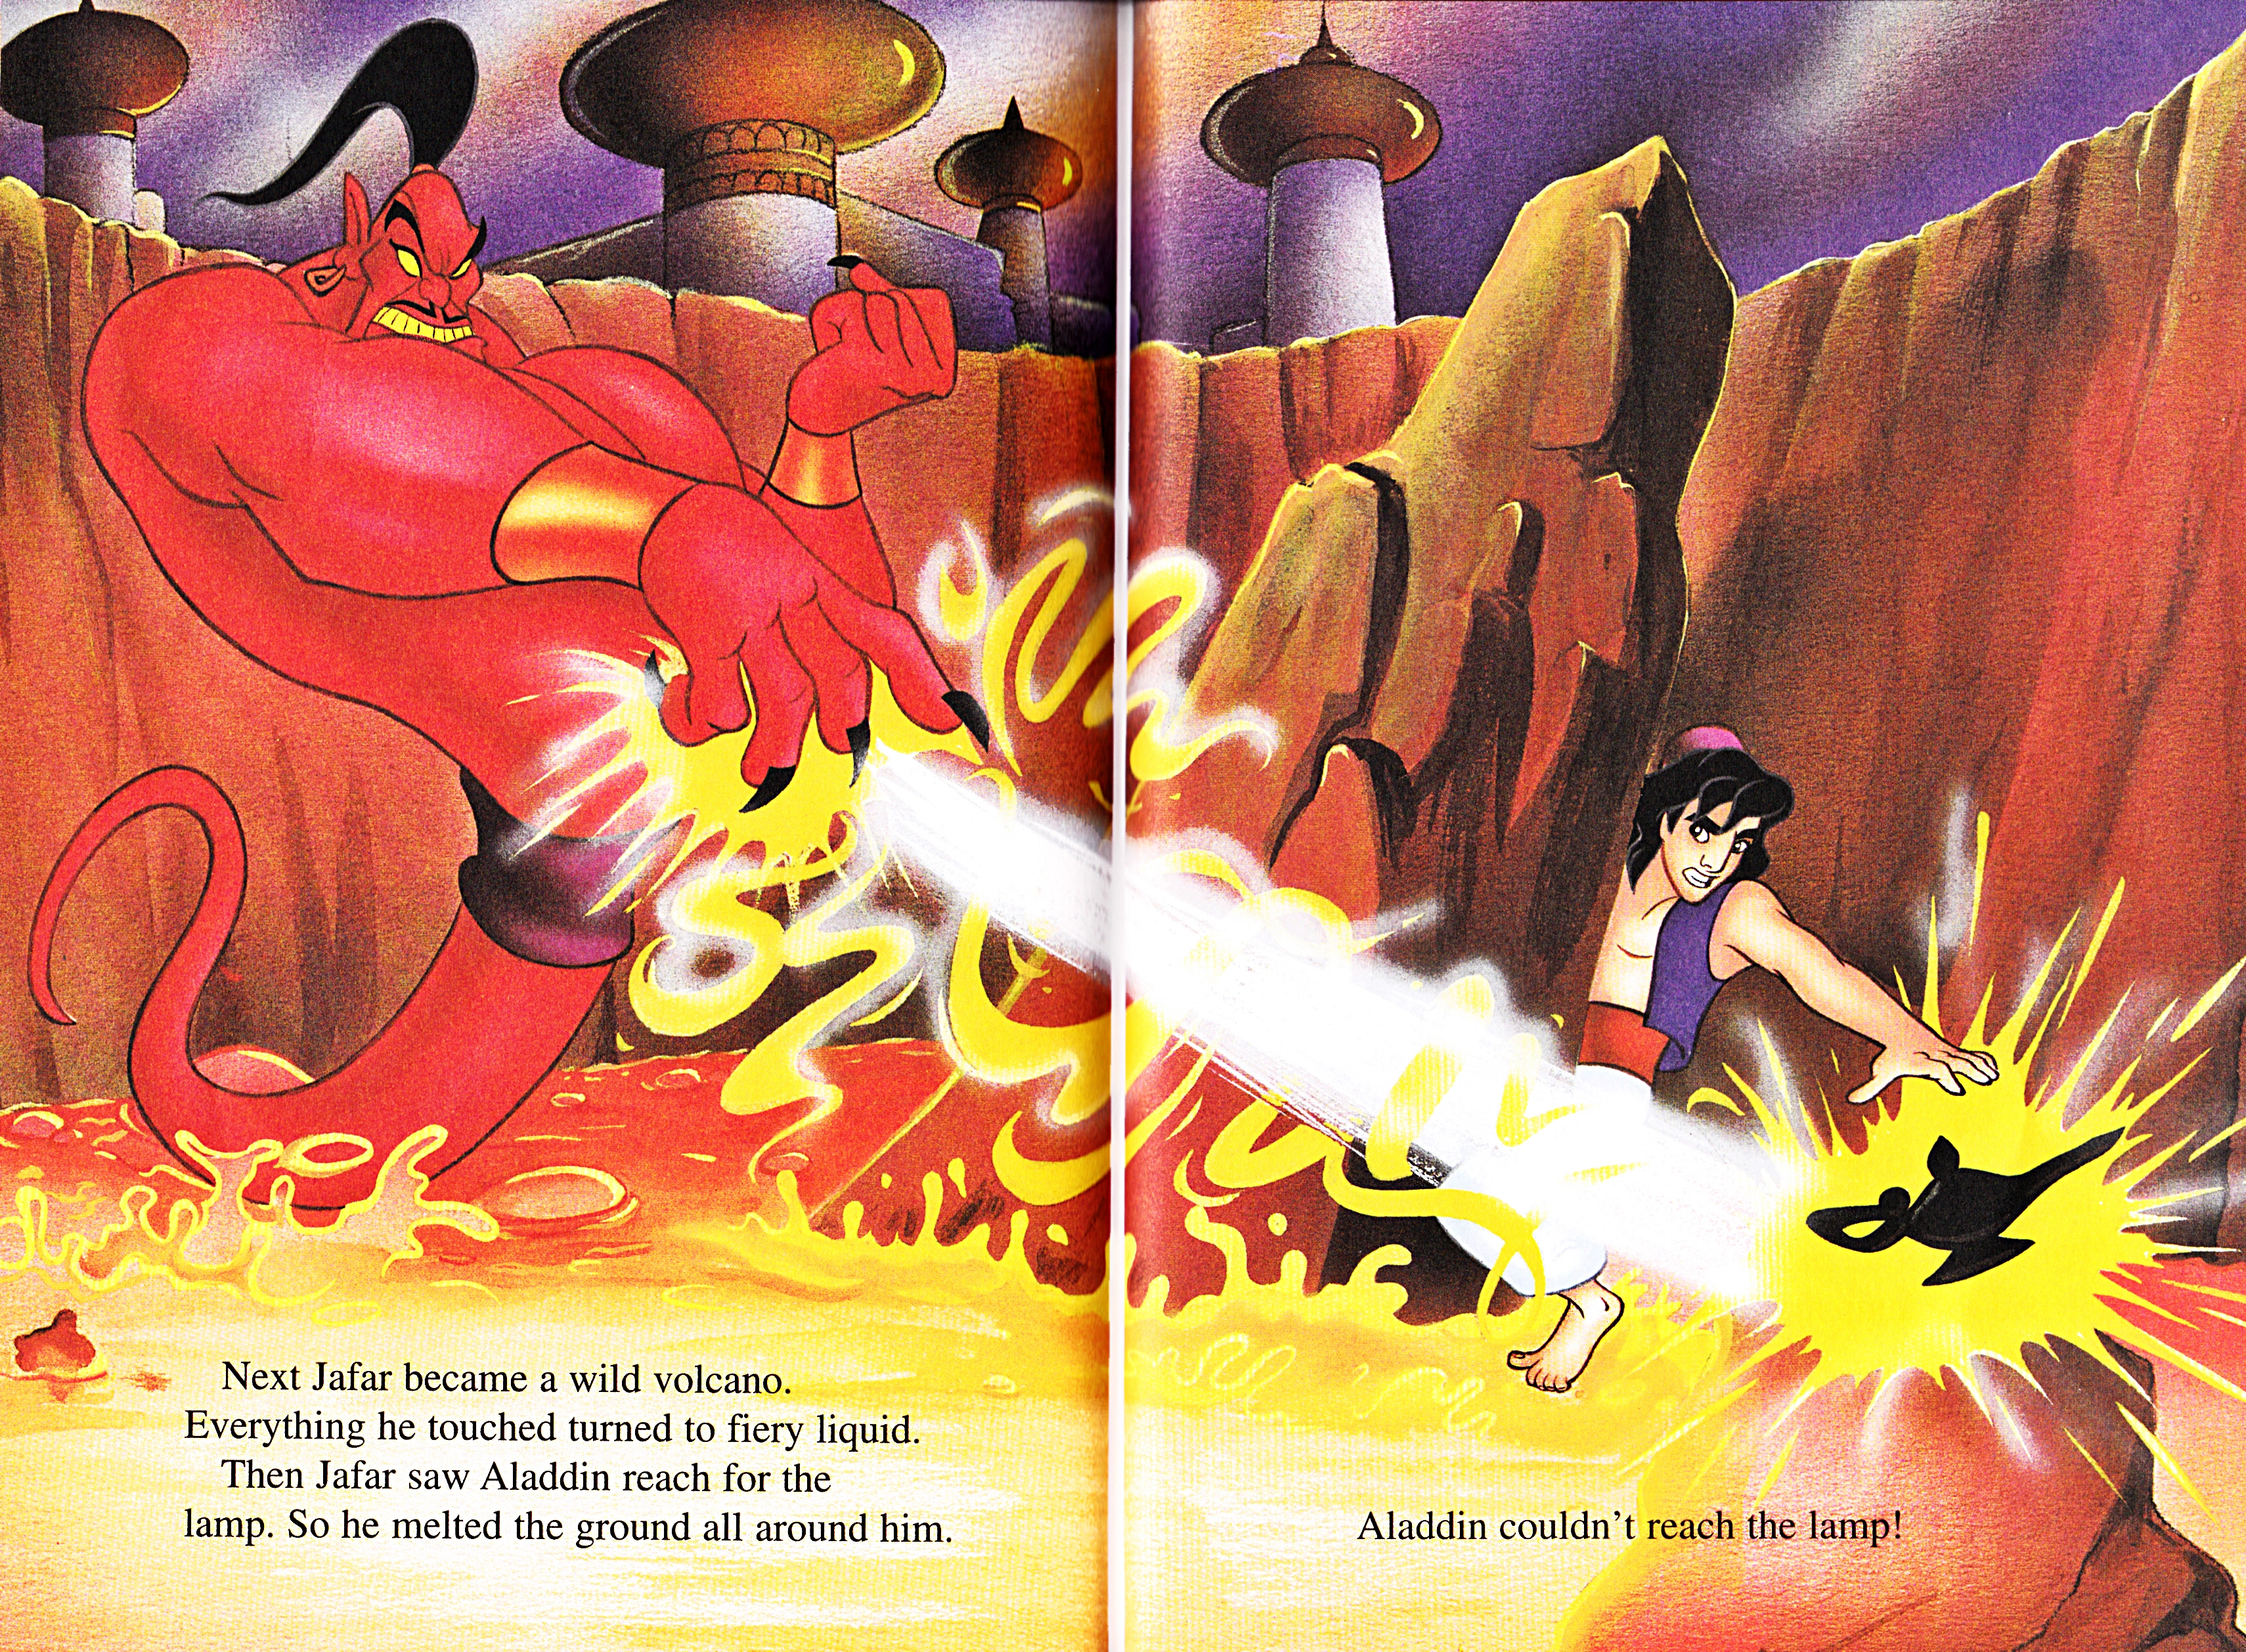 Walt Disney libri - Aladdin 2: The Return of Jafar